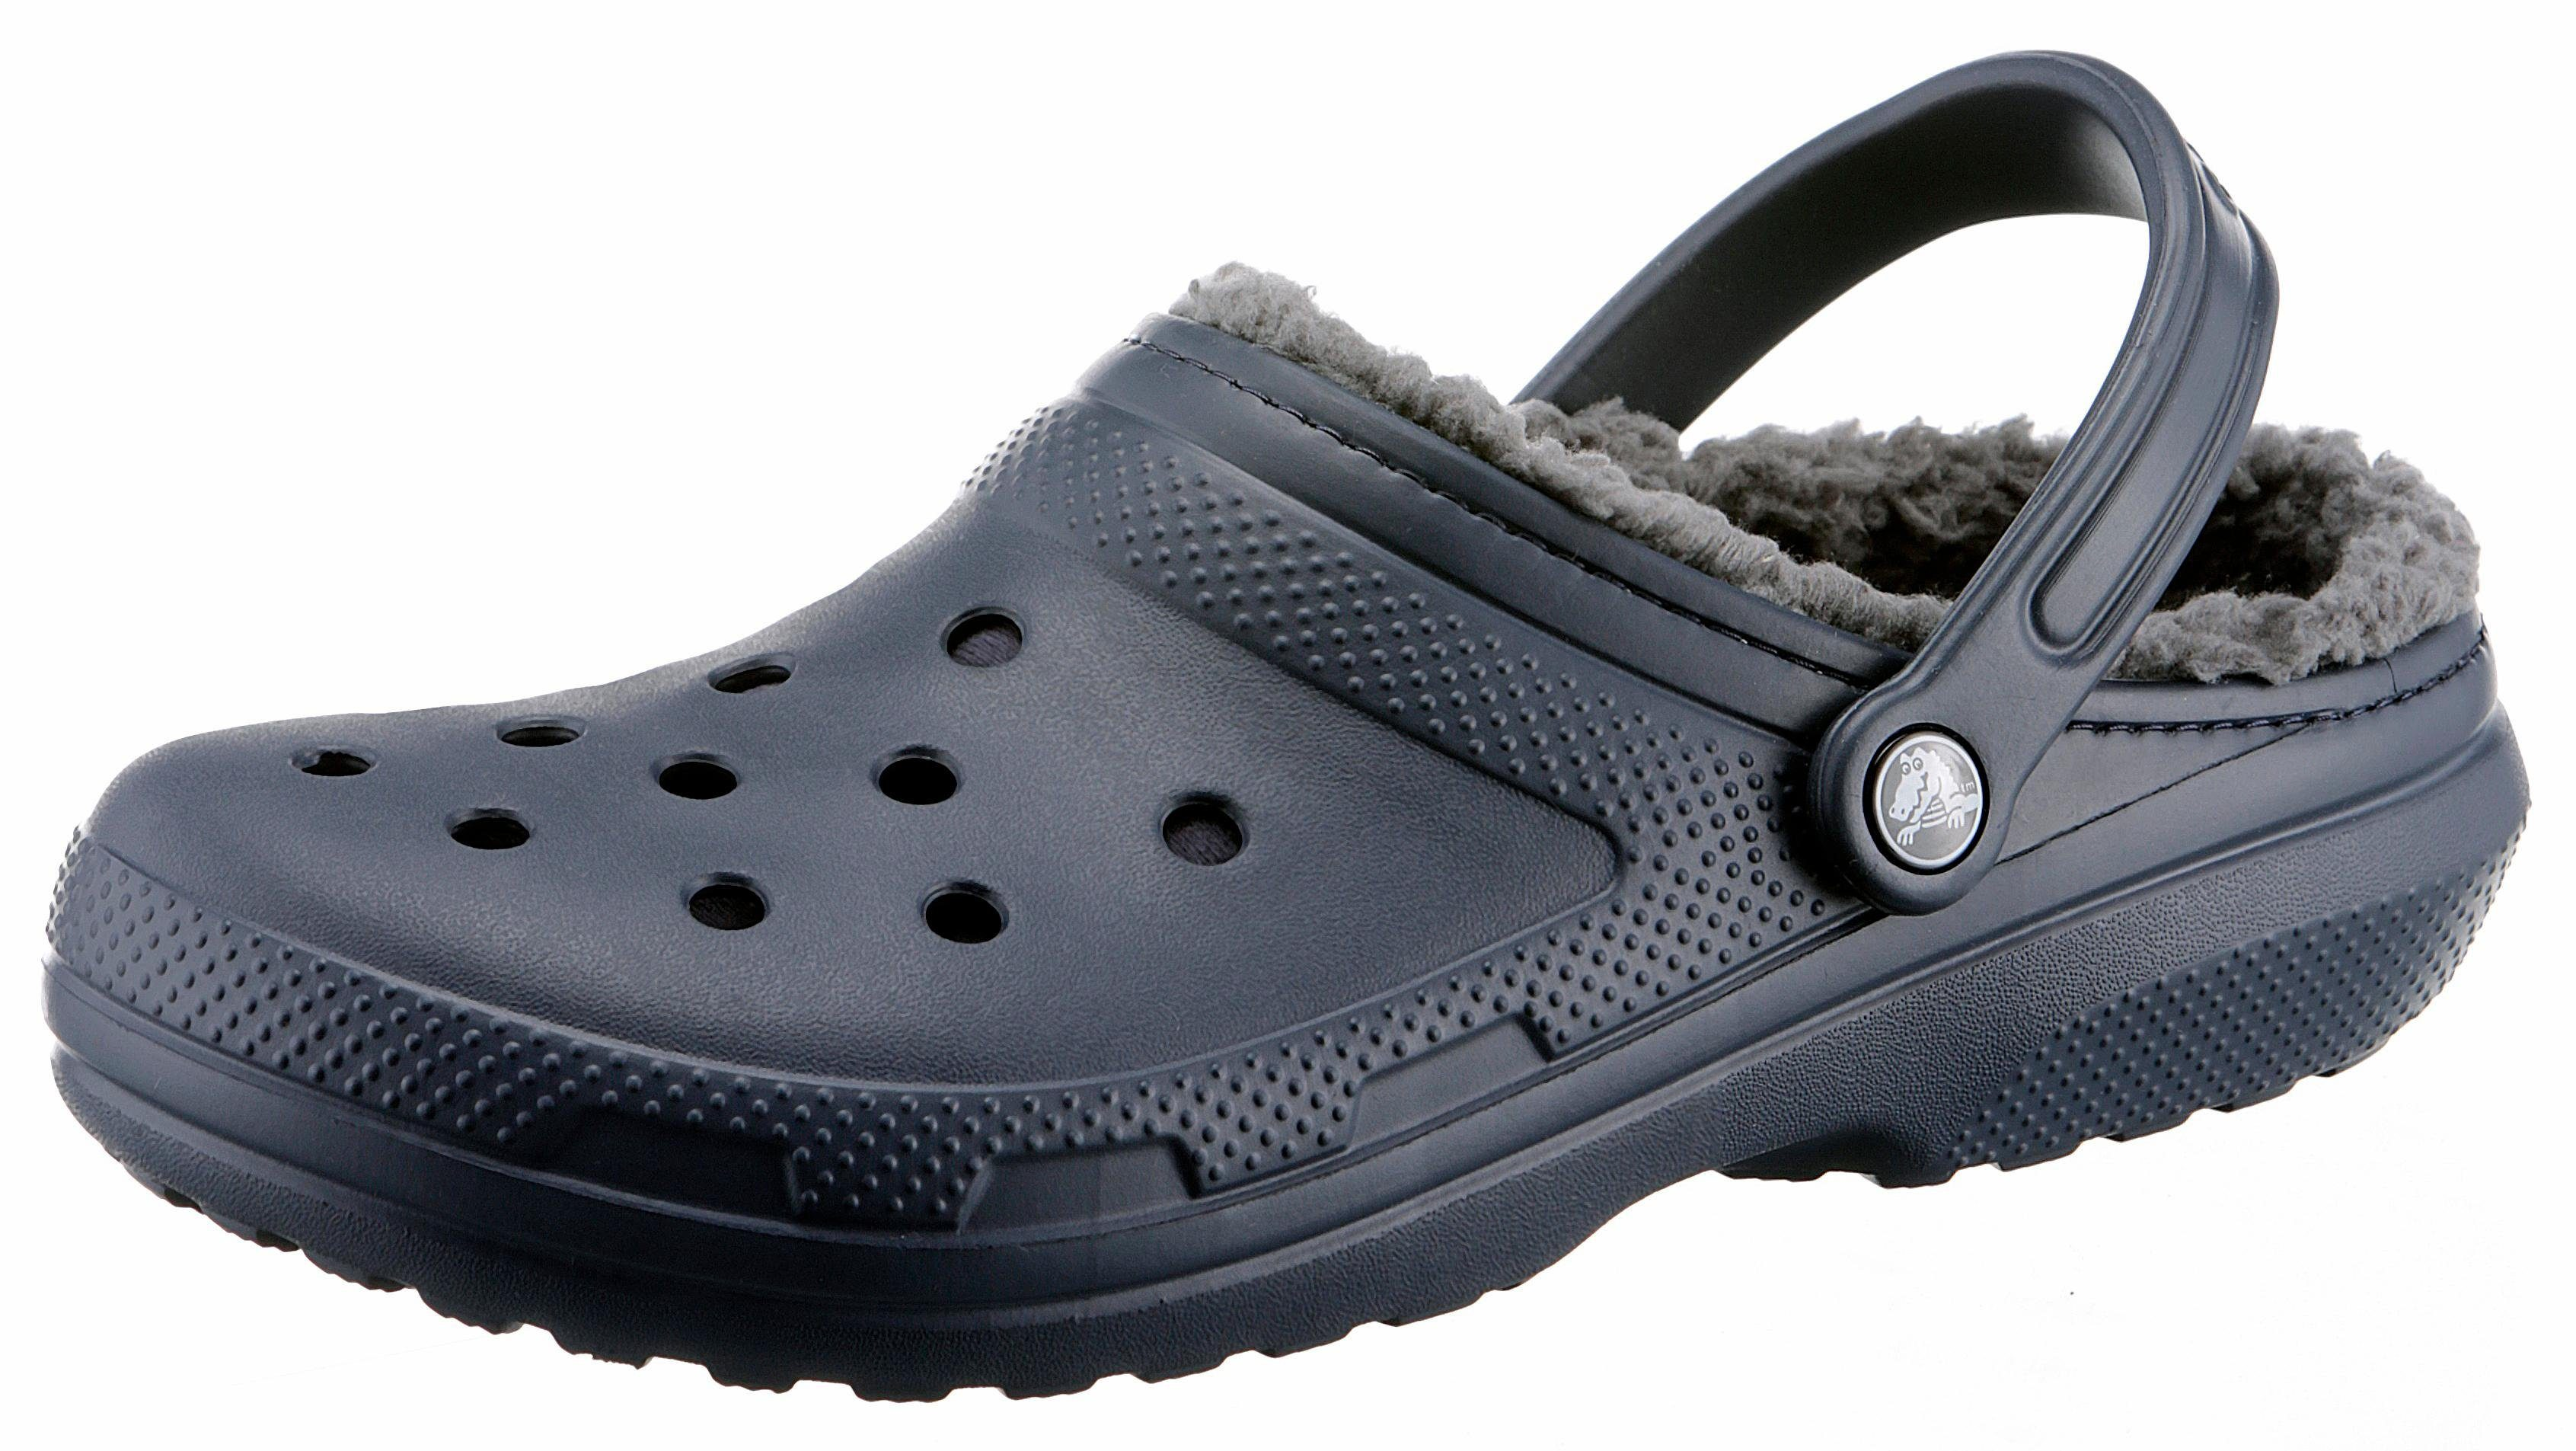 Crocs Classic Lined Clog Clog, mit kuscheligem Fellimitat online kaufen  navy